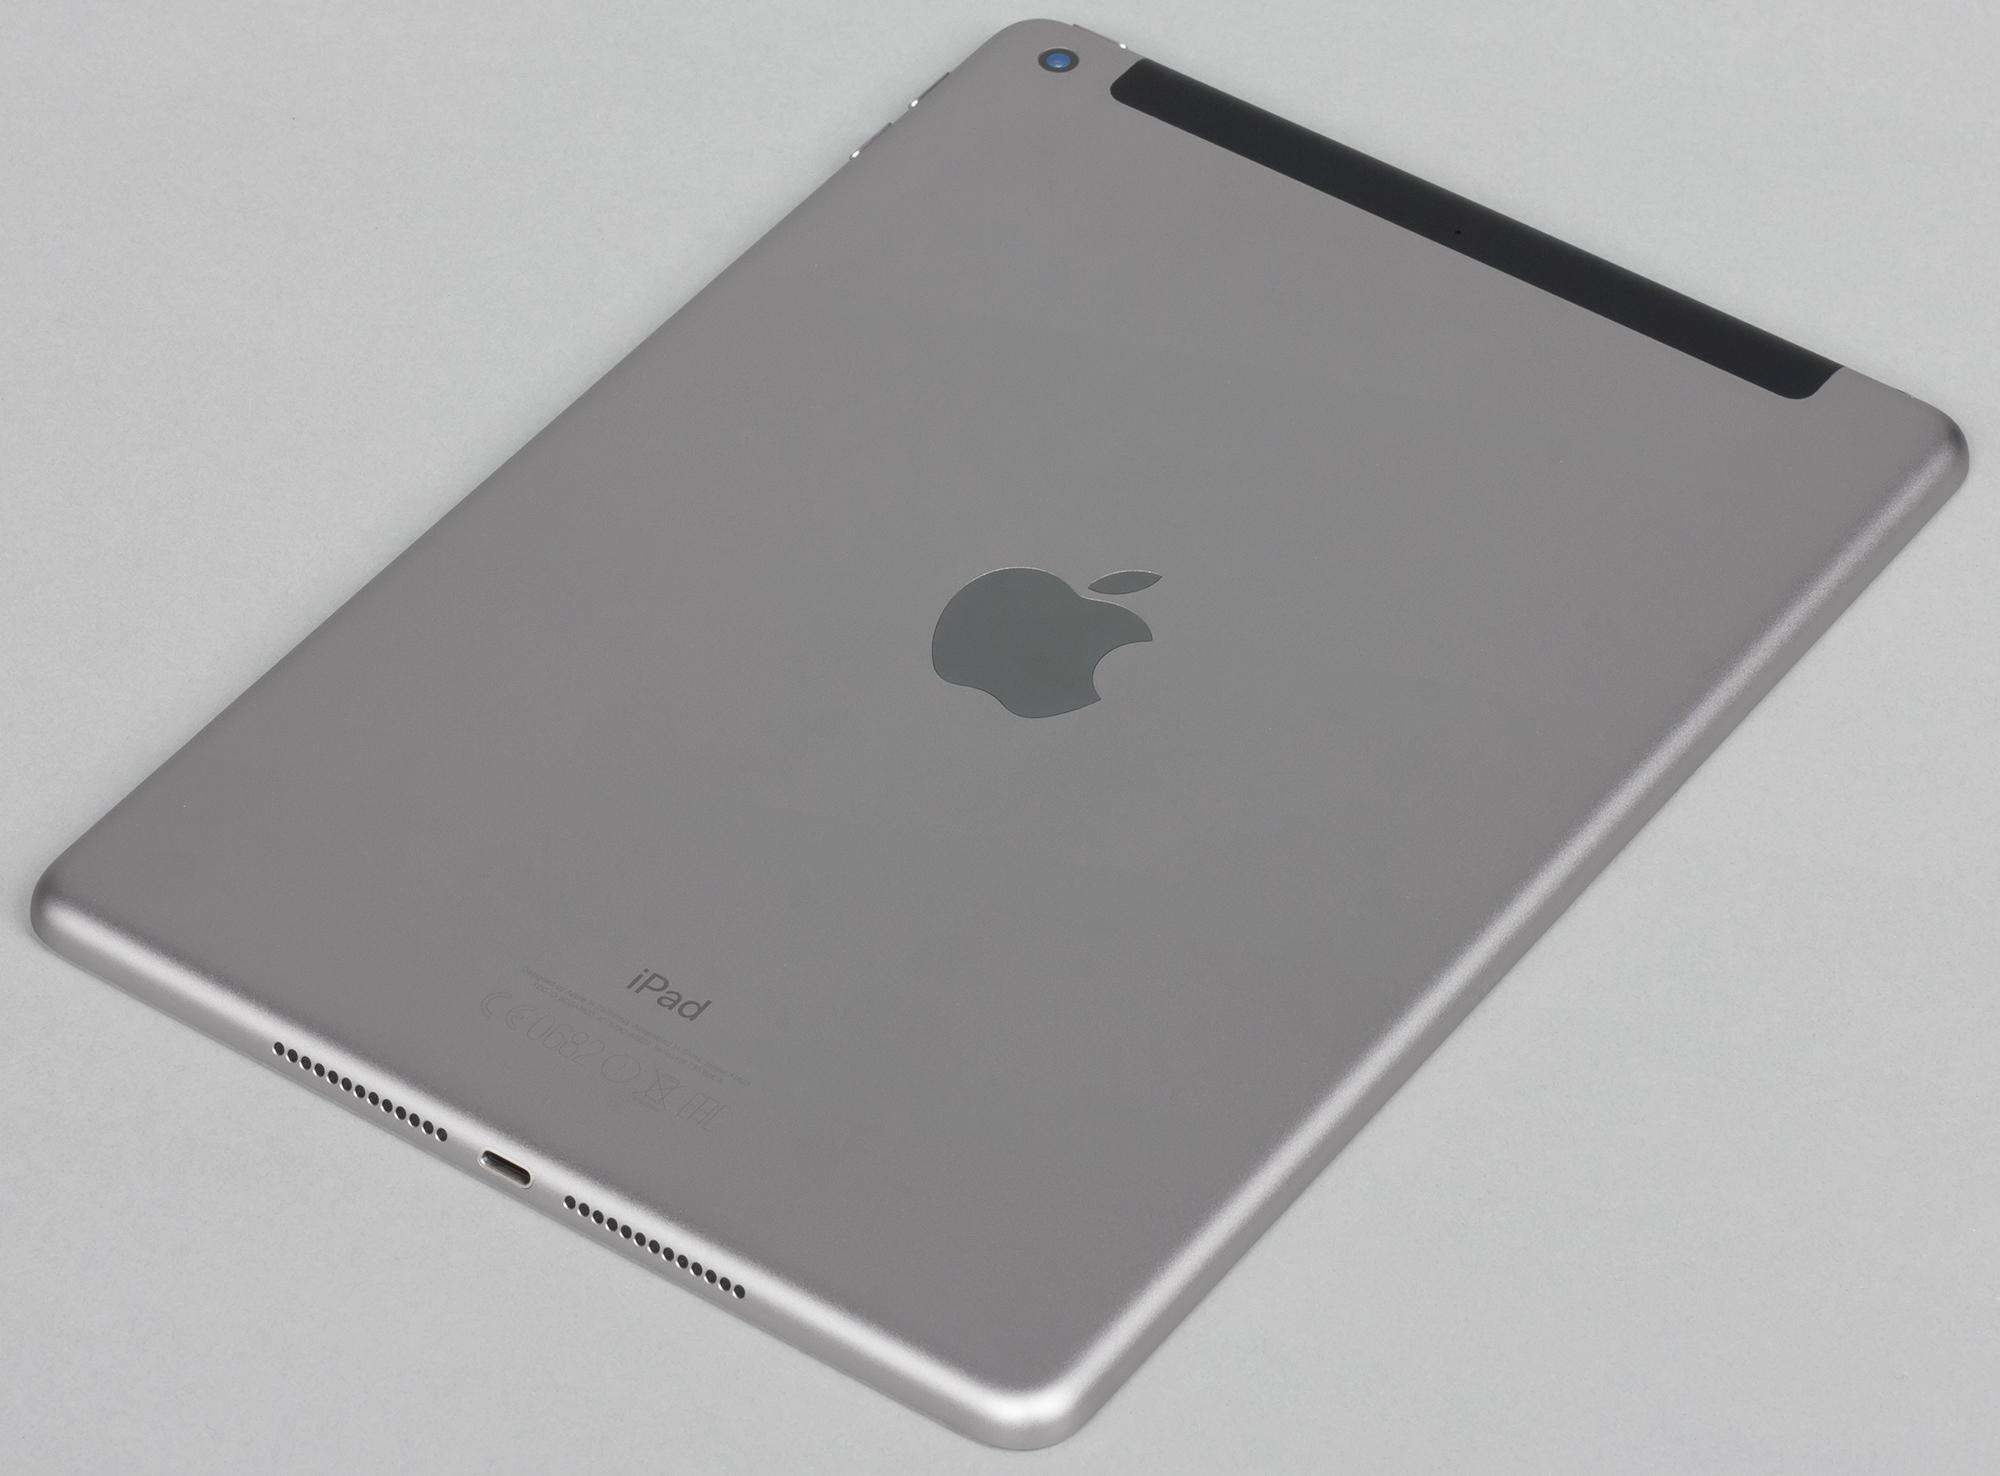 Планшет APPLE iPad 2017 9.7 Wi-Fi + Cellular 32Gb Space Grey MP1J2RU/A